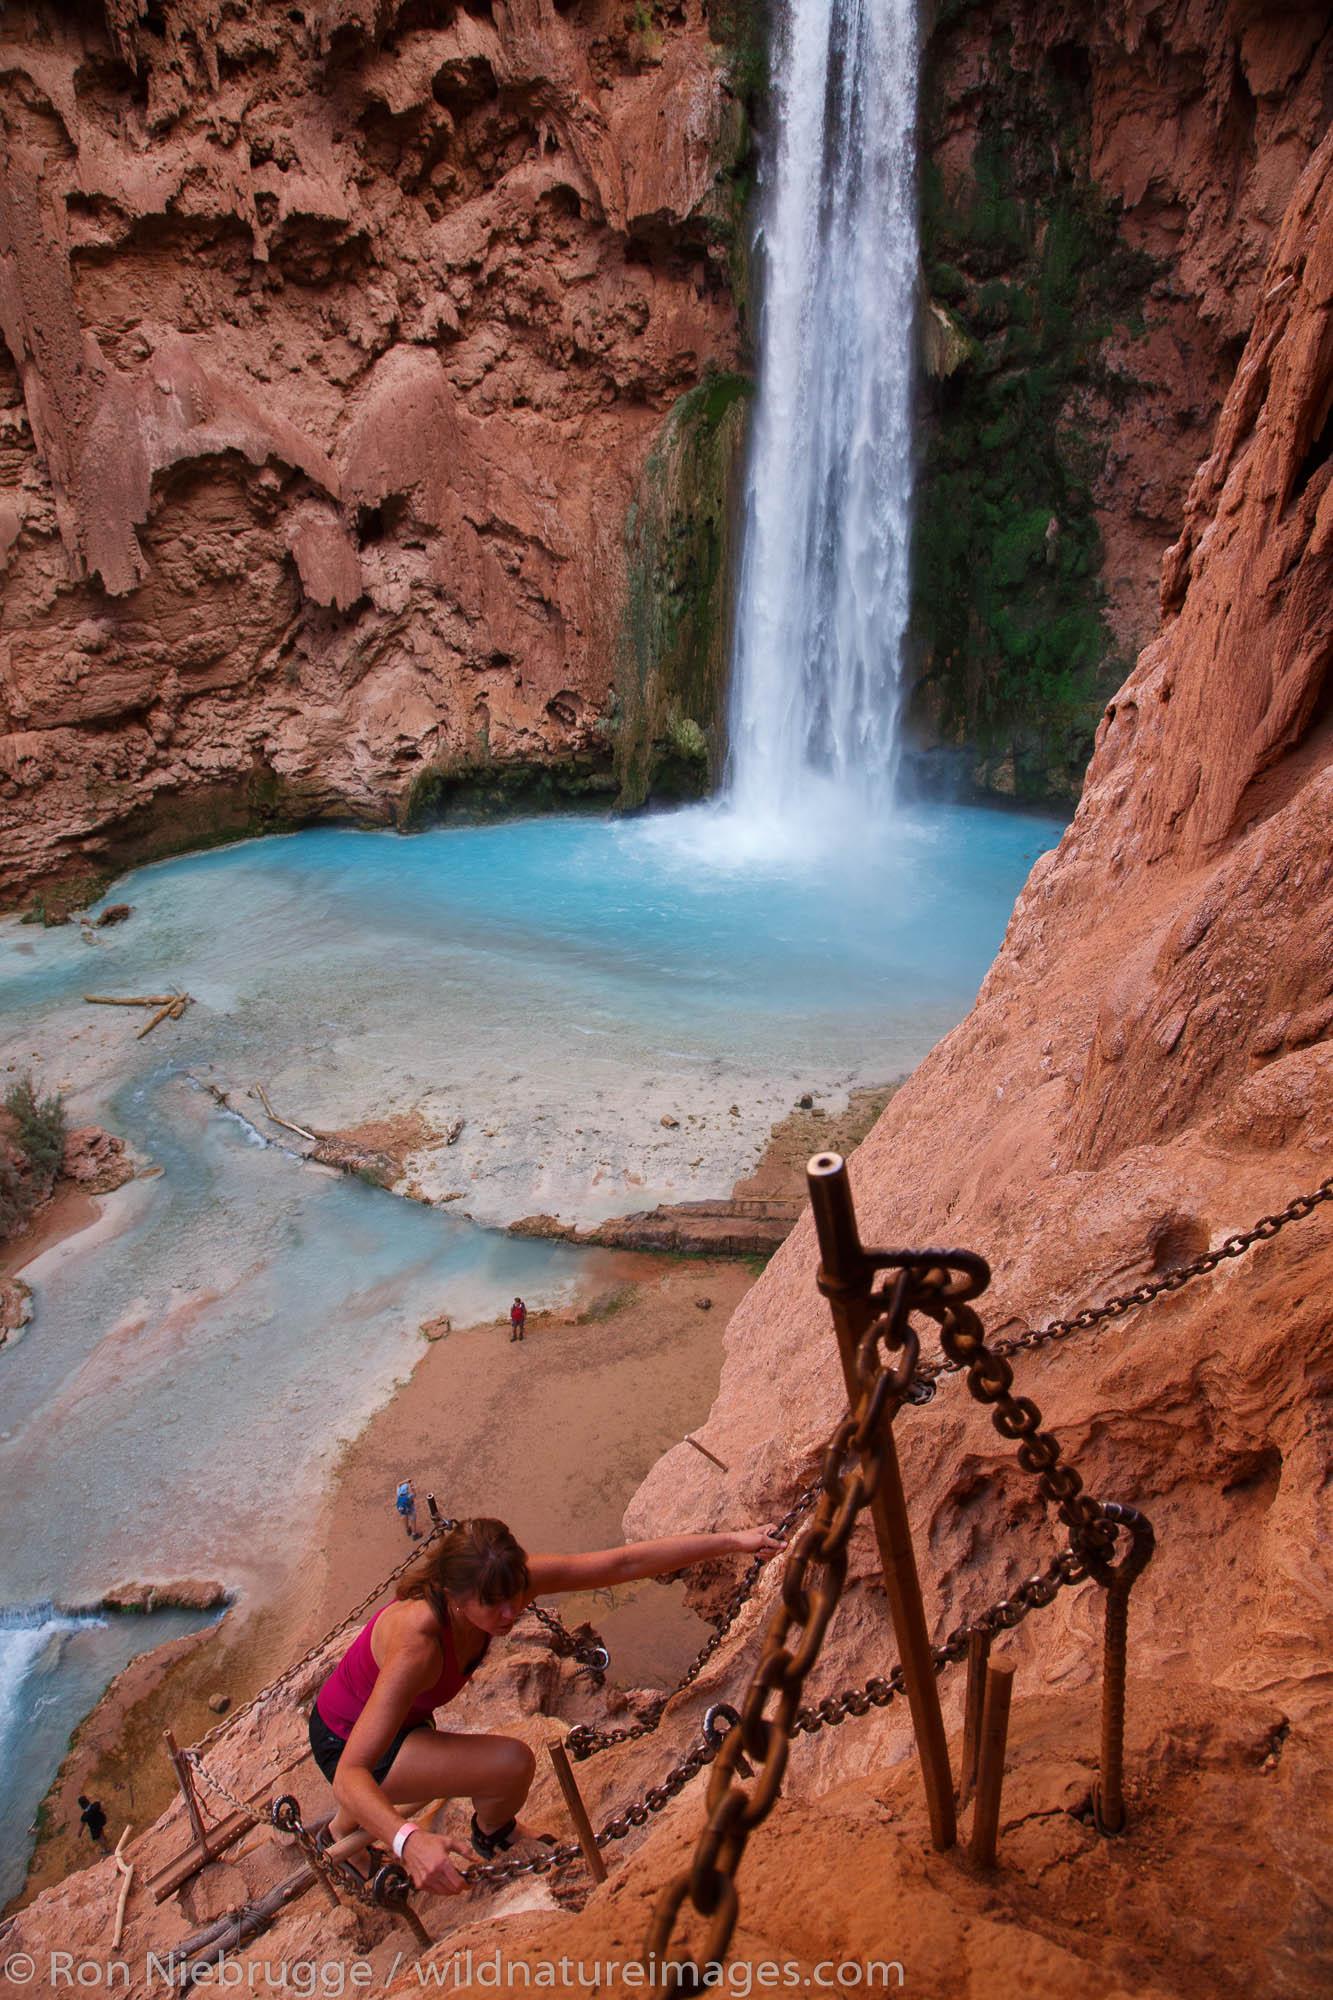 Trail to Mooney Falls, Havasupai Indian Reservation, Grand Canyon, Arizona.